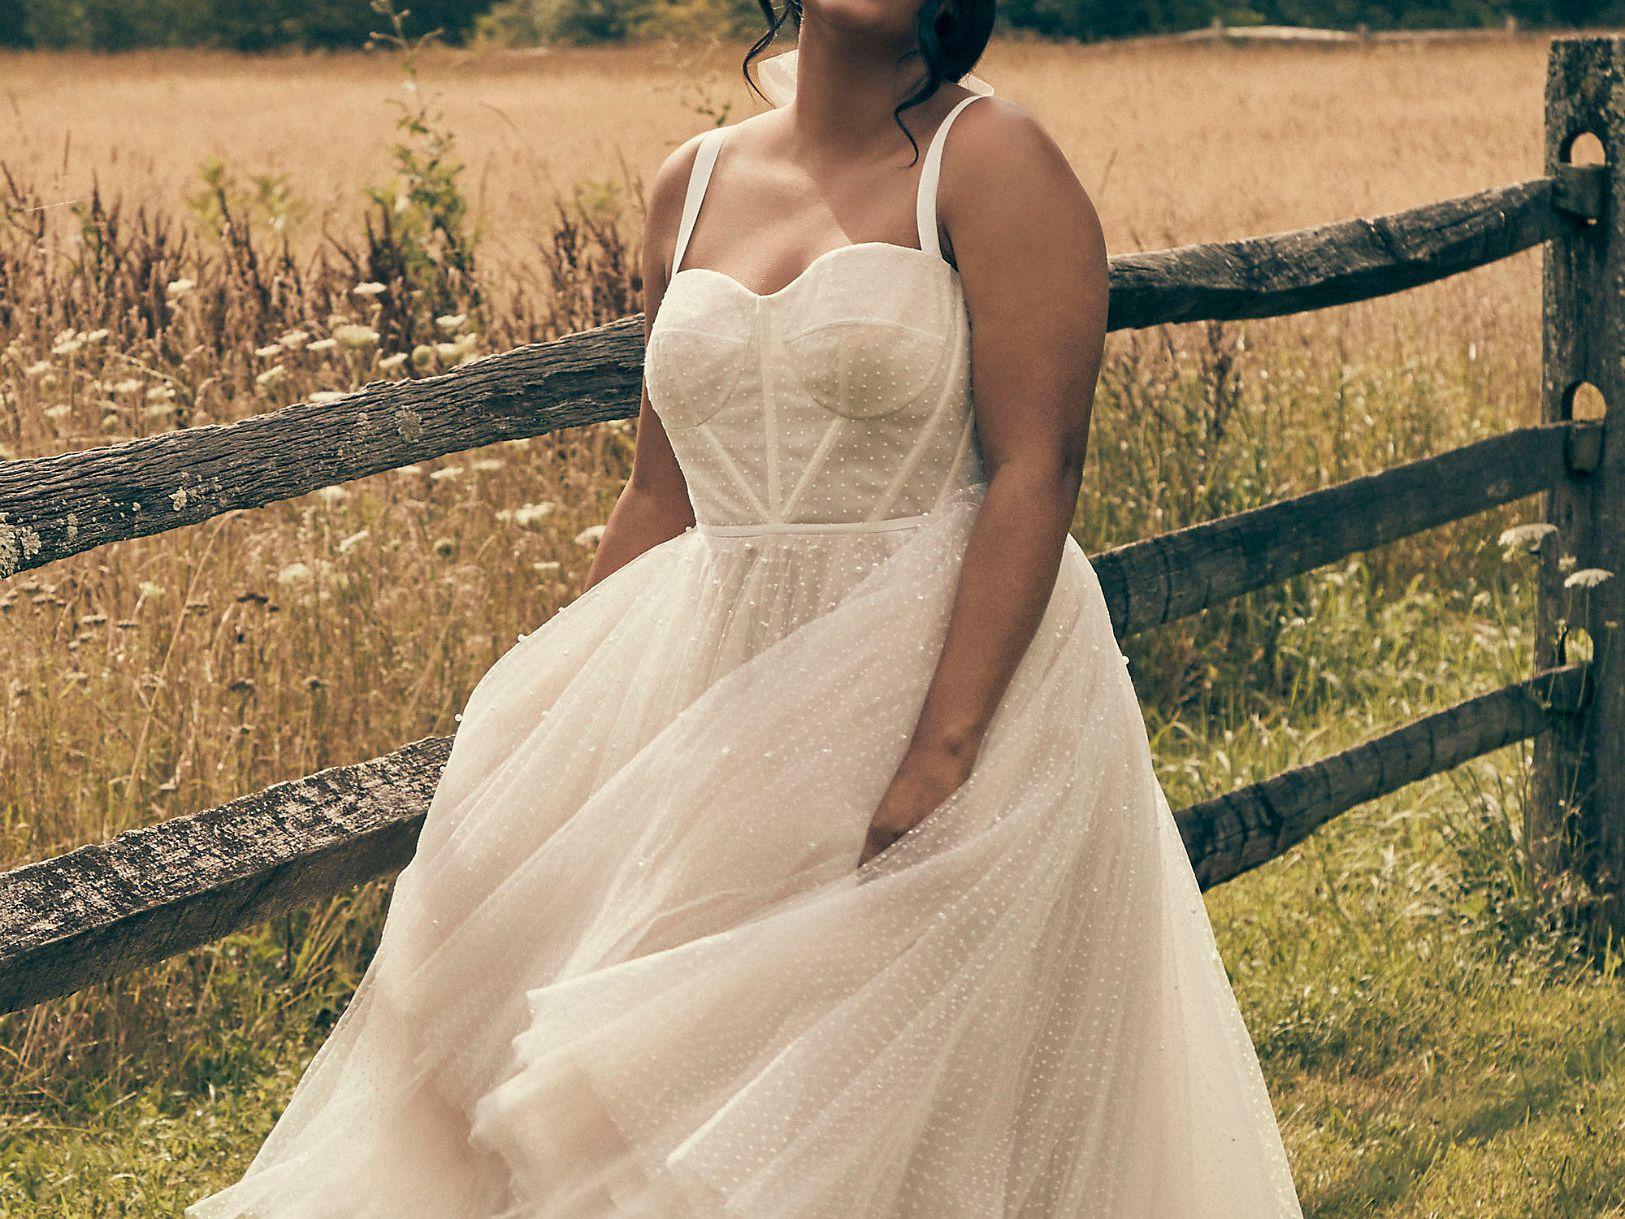 The 30 Best Wedding Dresses Under 1 000 Of 2020,Summer Wedding Dresses Guest 2020